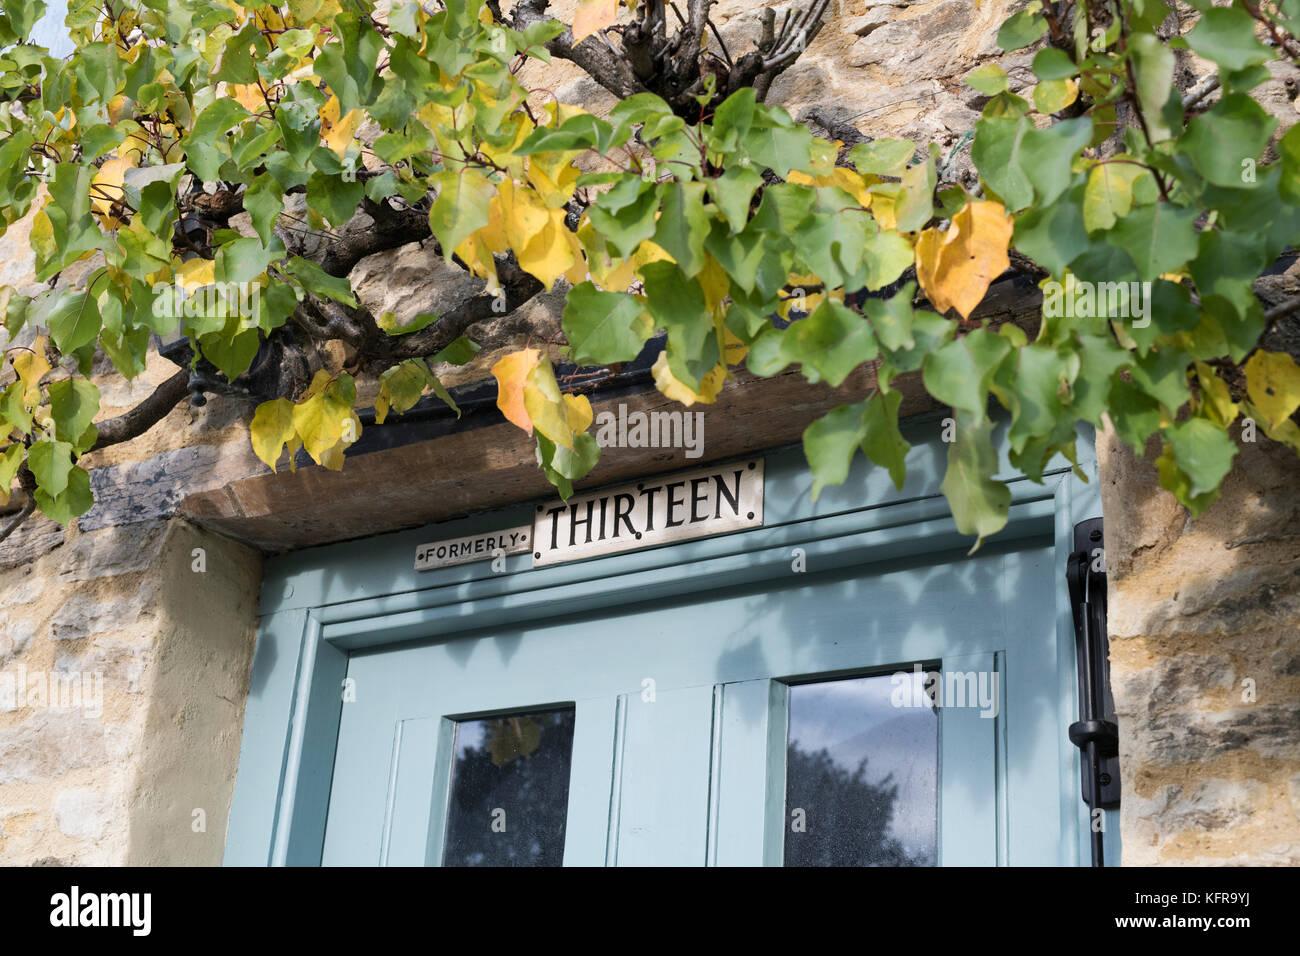 Anciennement treize de la porte du chalet sign in Aynho, South Northamptonshire, Angleterre Photo Stock